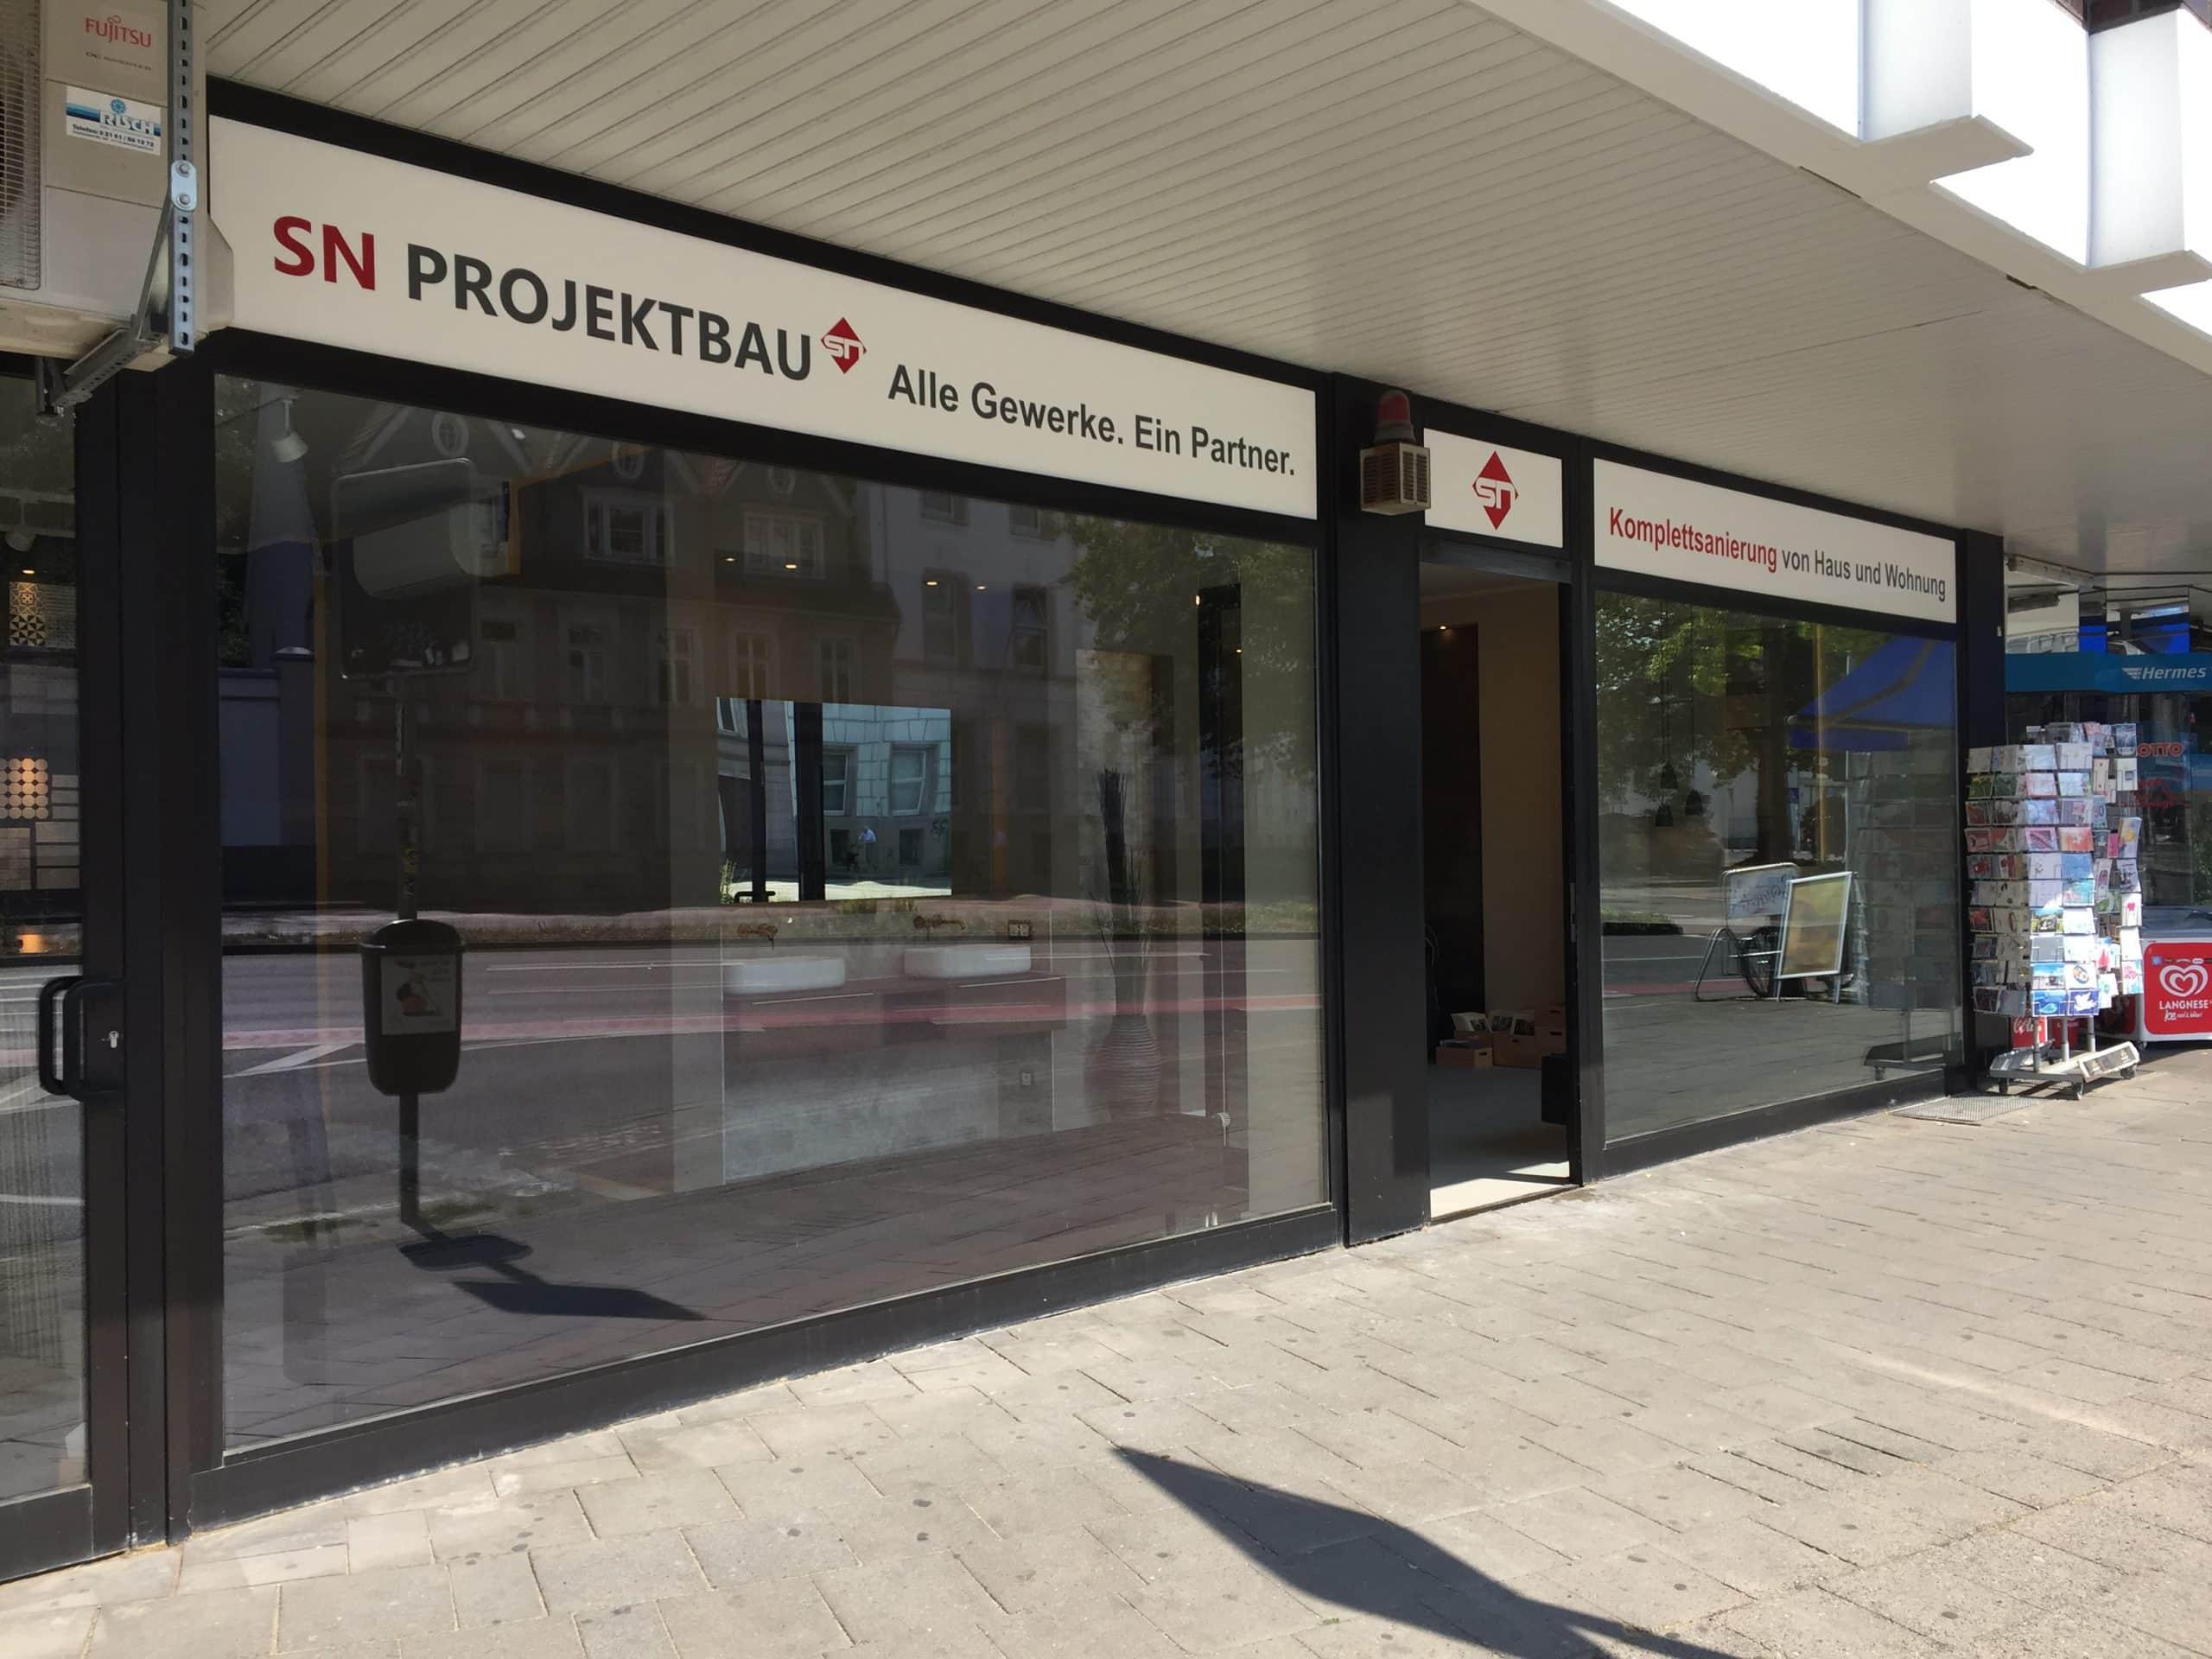 SN Projektbau Showroom